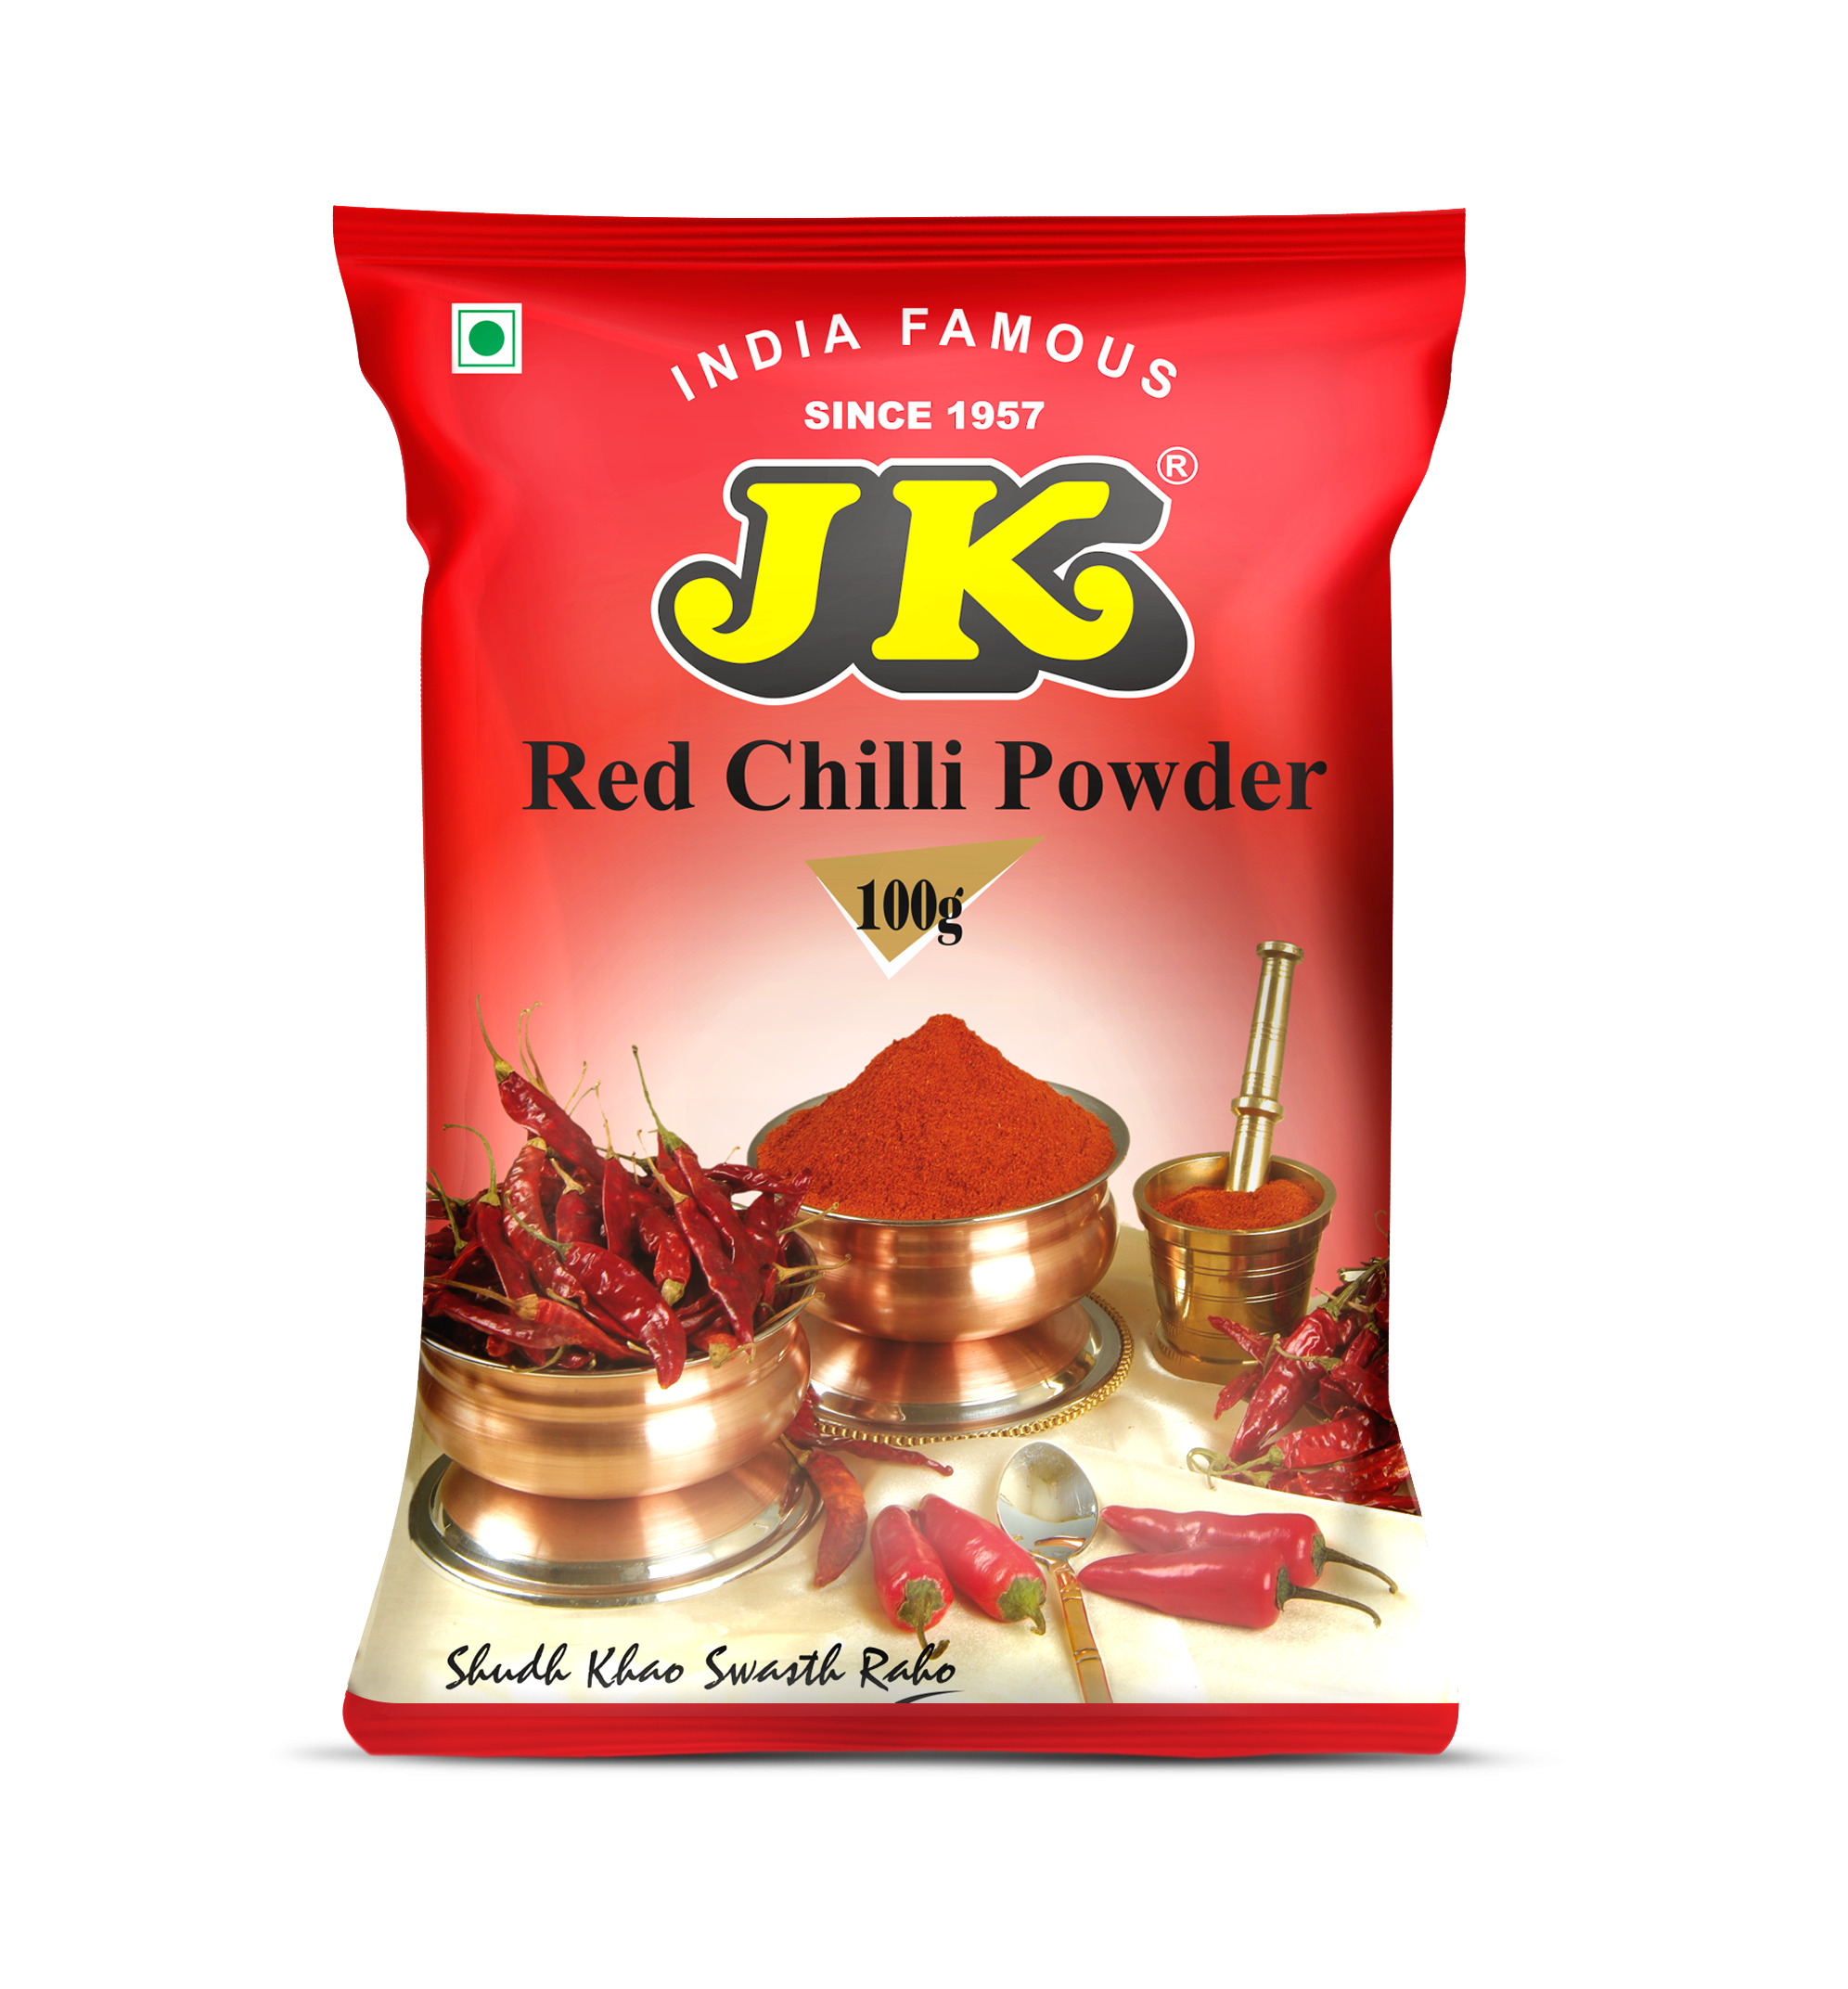 JK Red Chilli Powder